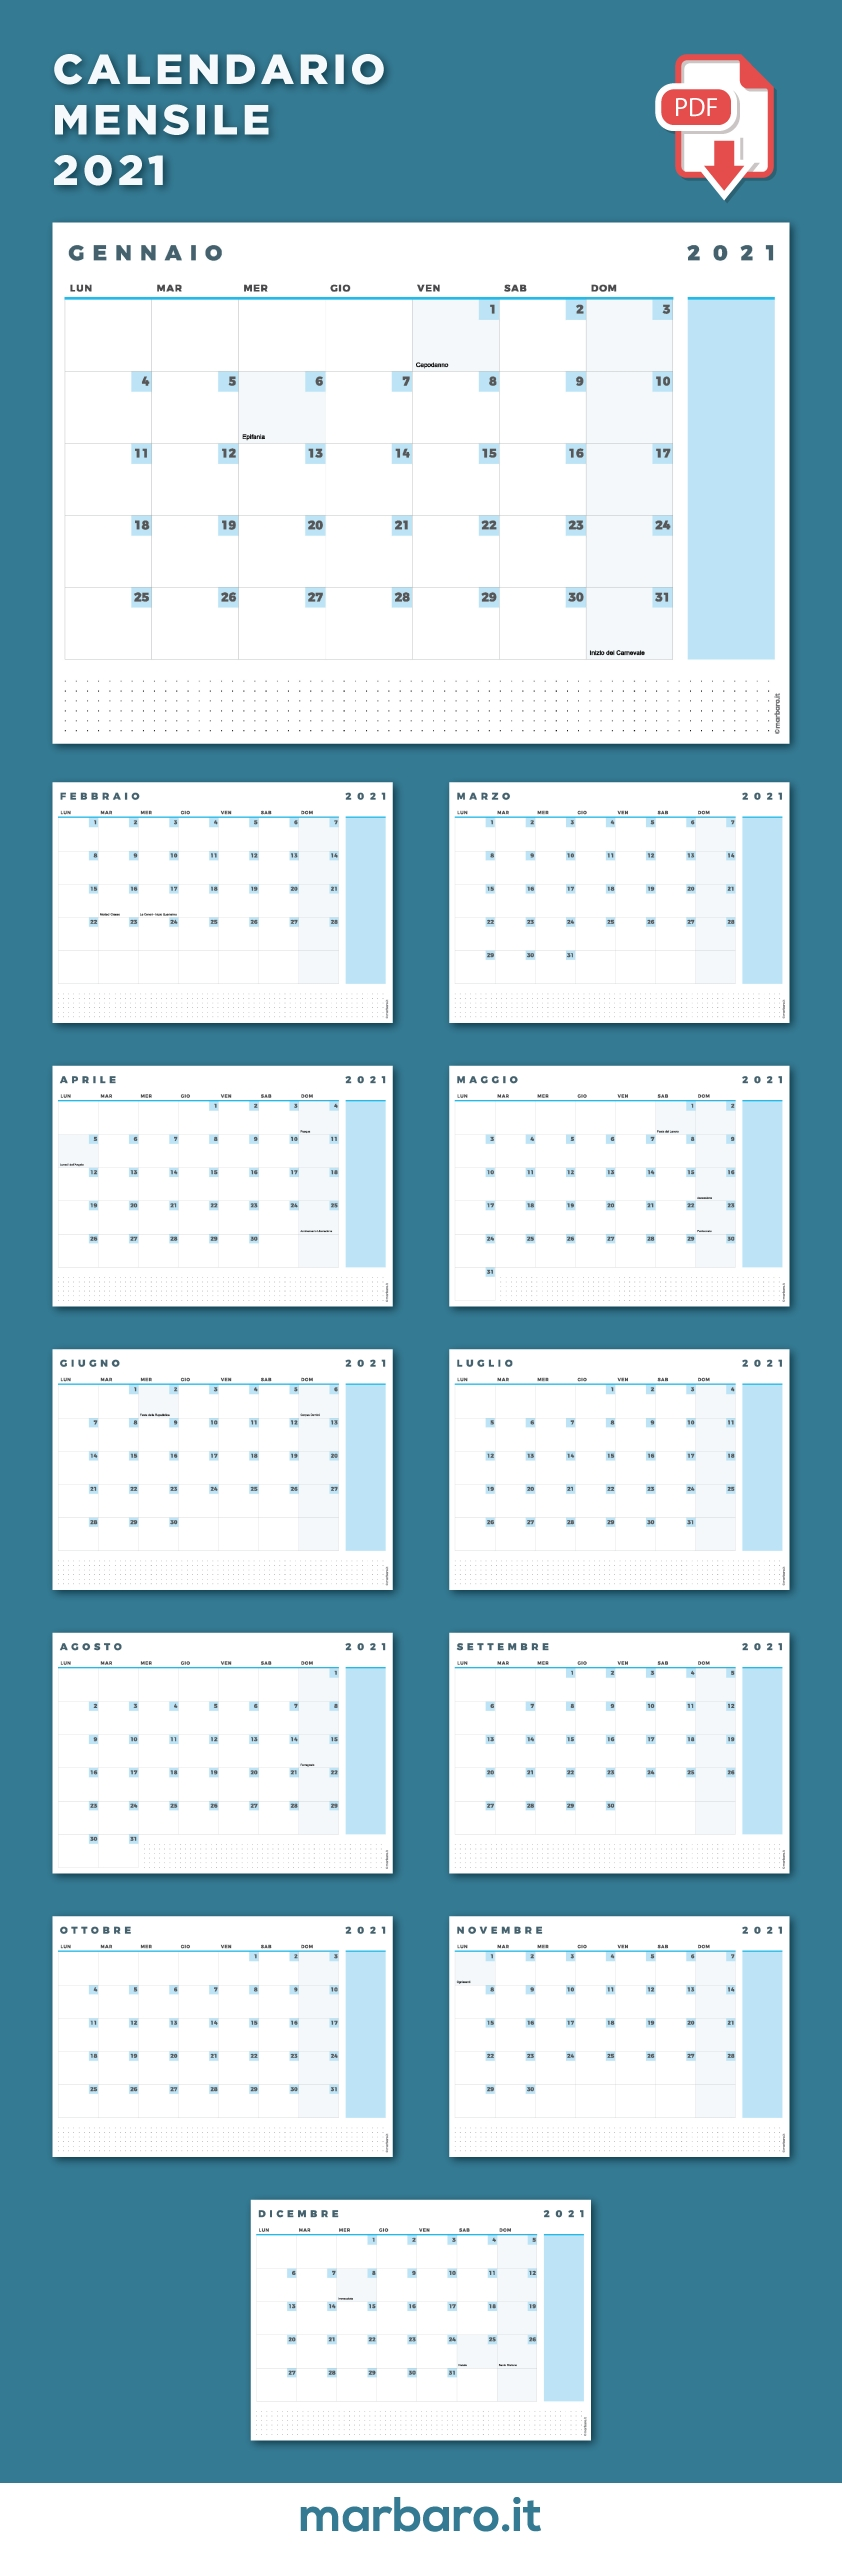 Marbaroit - Agende, Calendari, Planner Stampabili